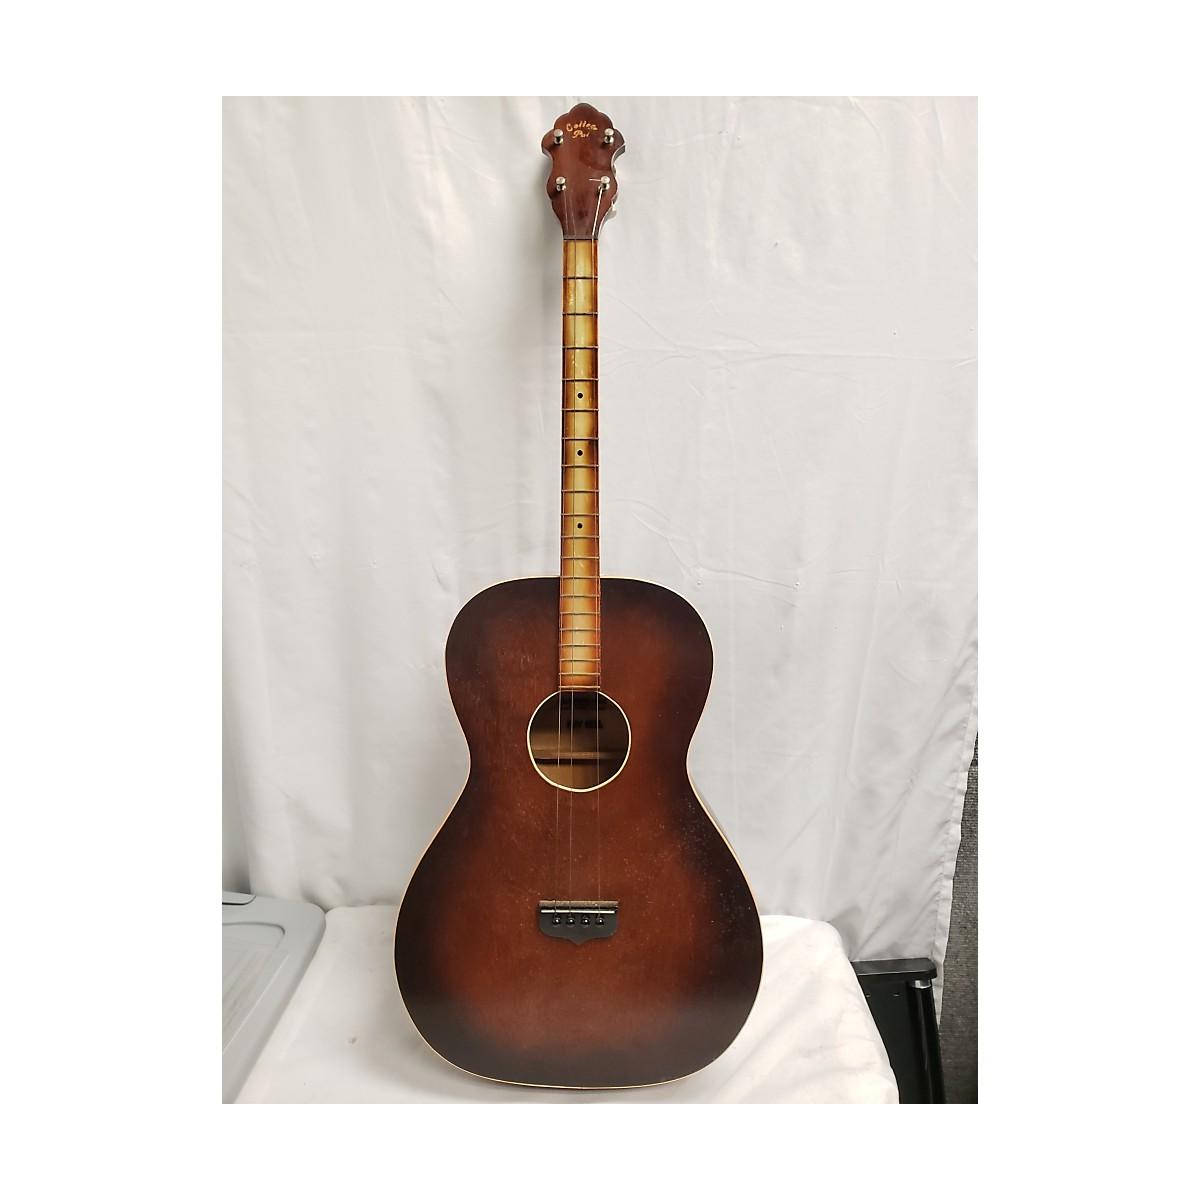 Slingerland 1930s May Bell Tenor Acoustic Guitar